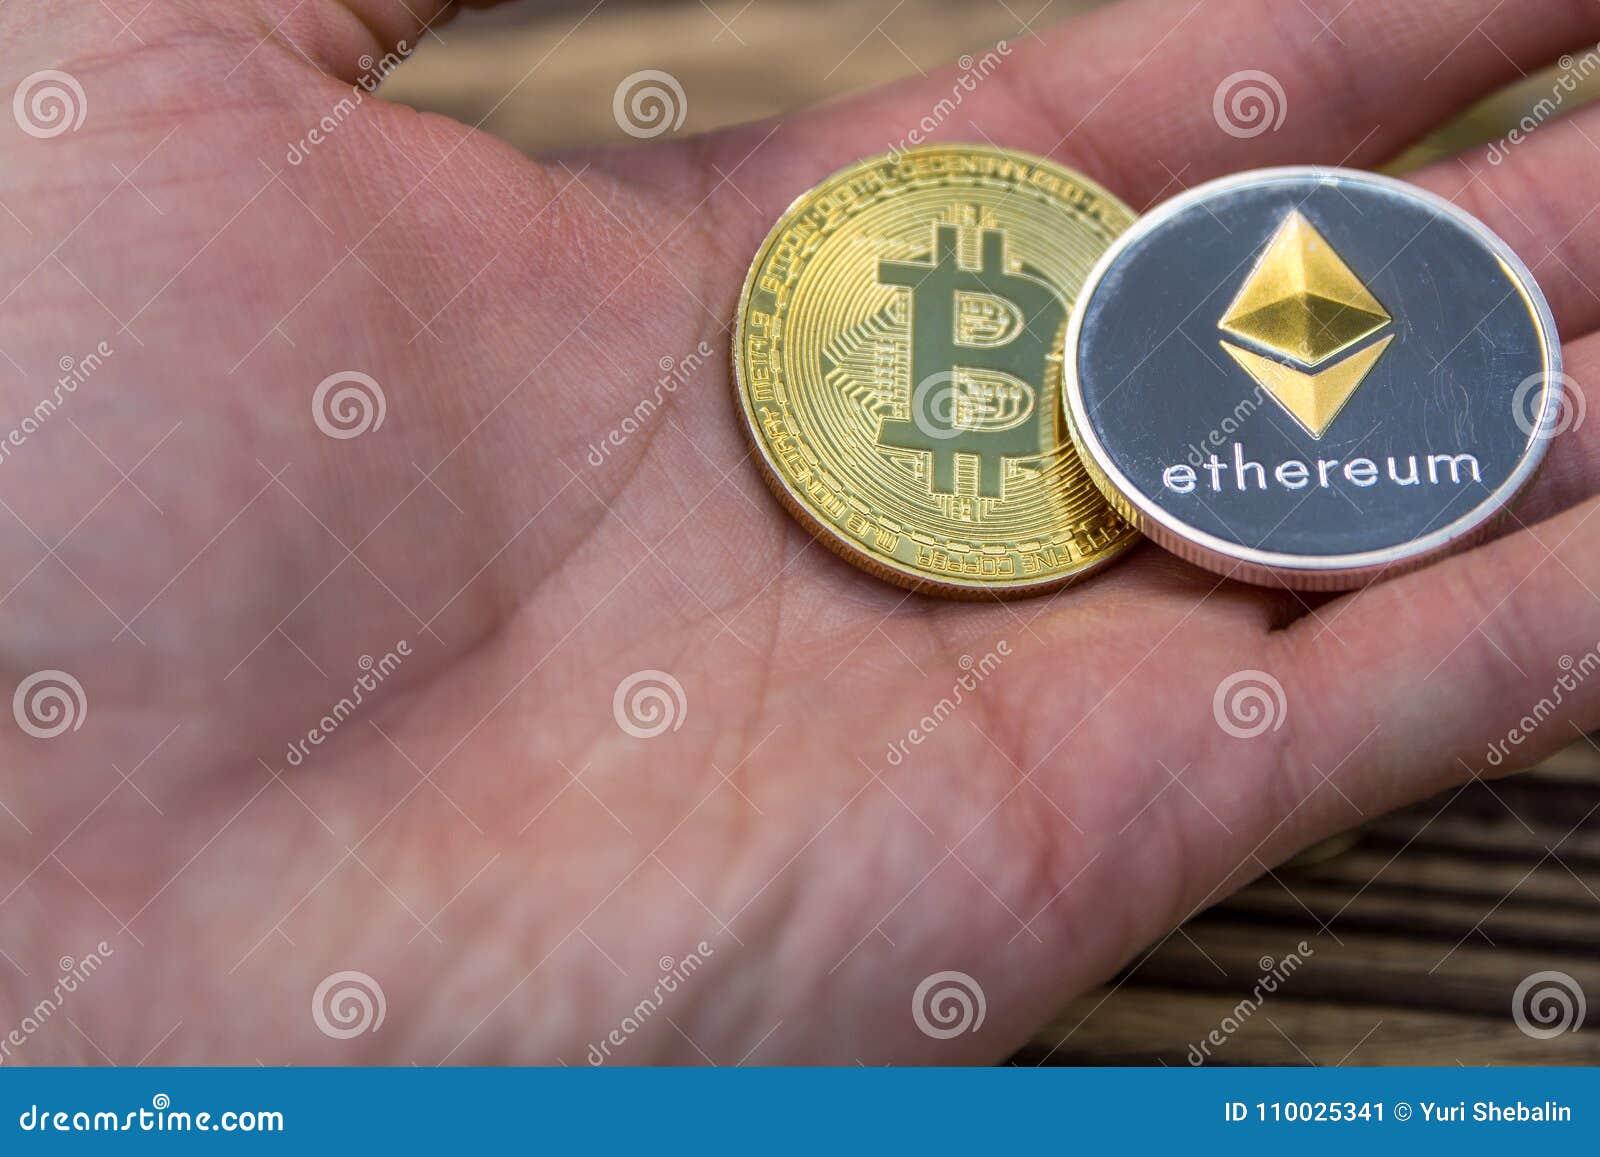 Bitcoin en ethereum liggen bemannen handclose-up